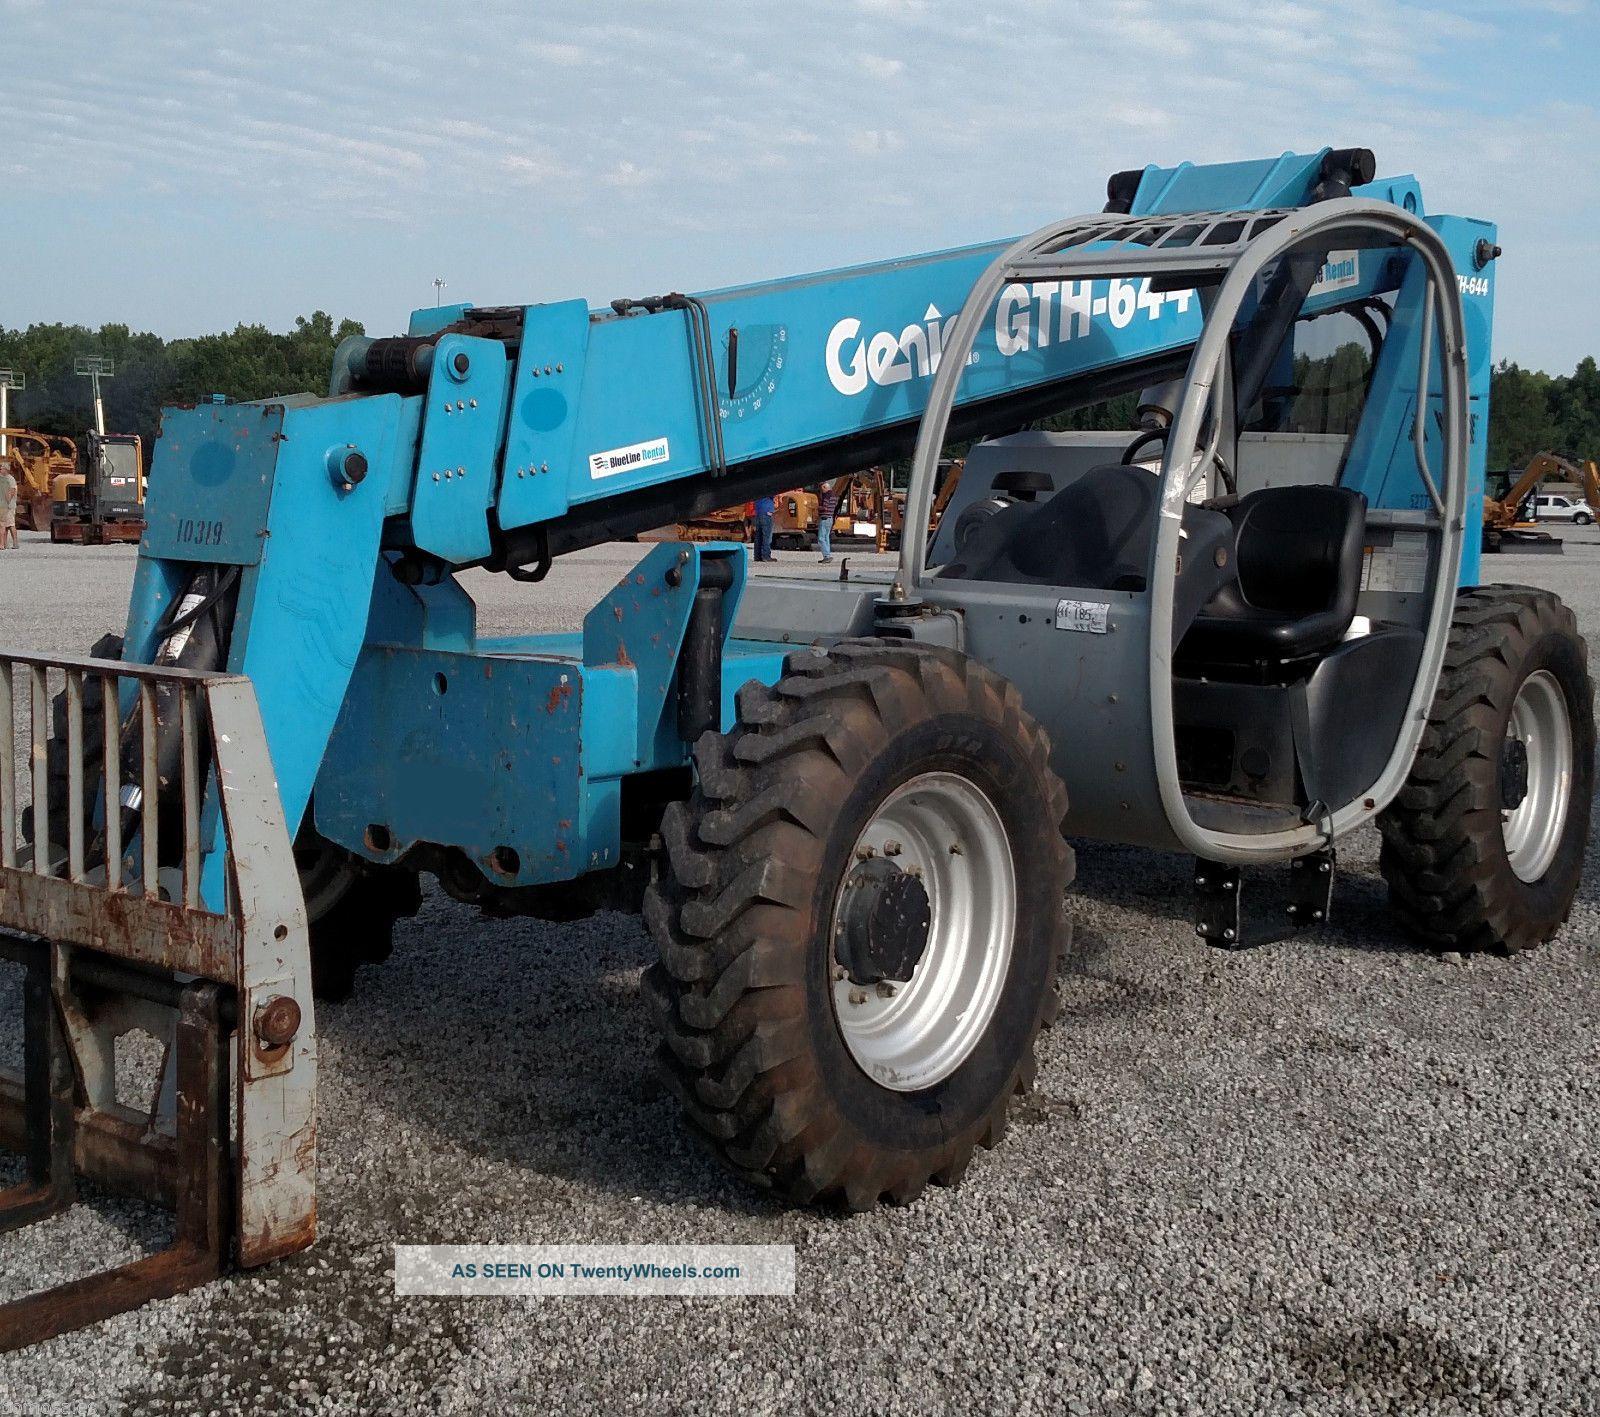 2006 Genie Gth 644 Telescoping Forklift